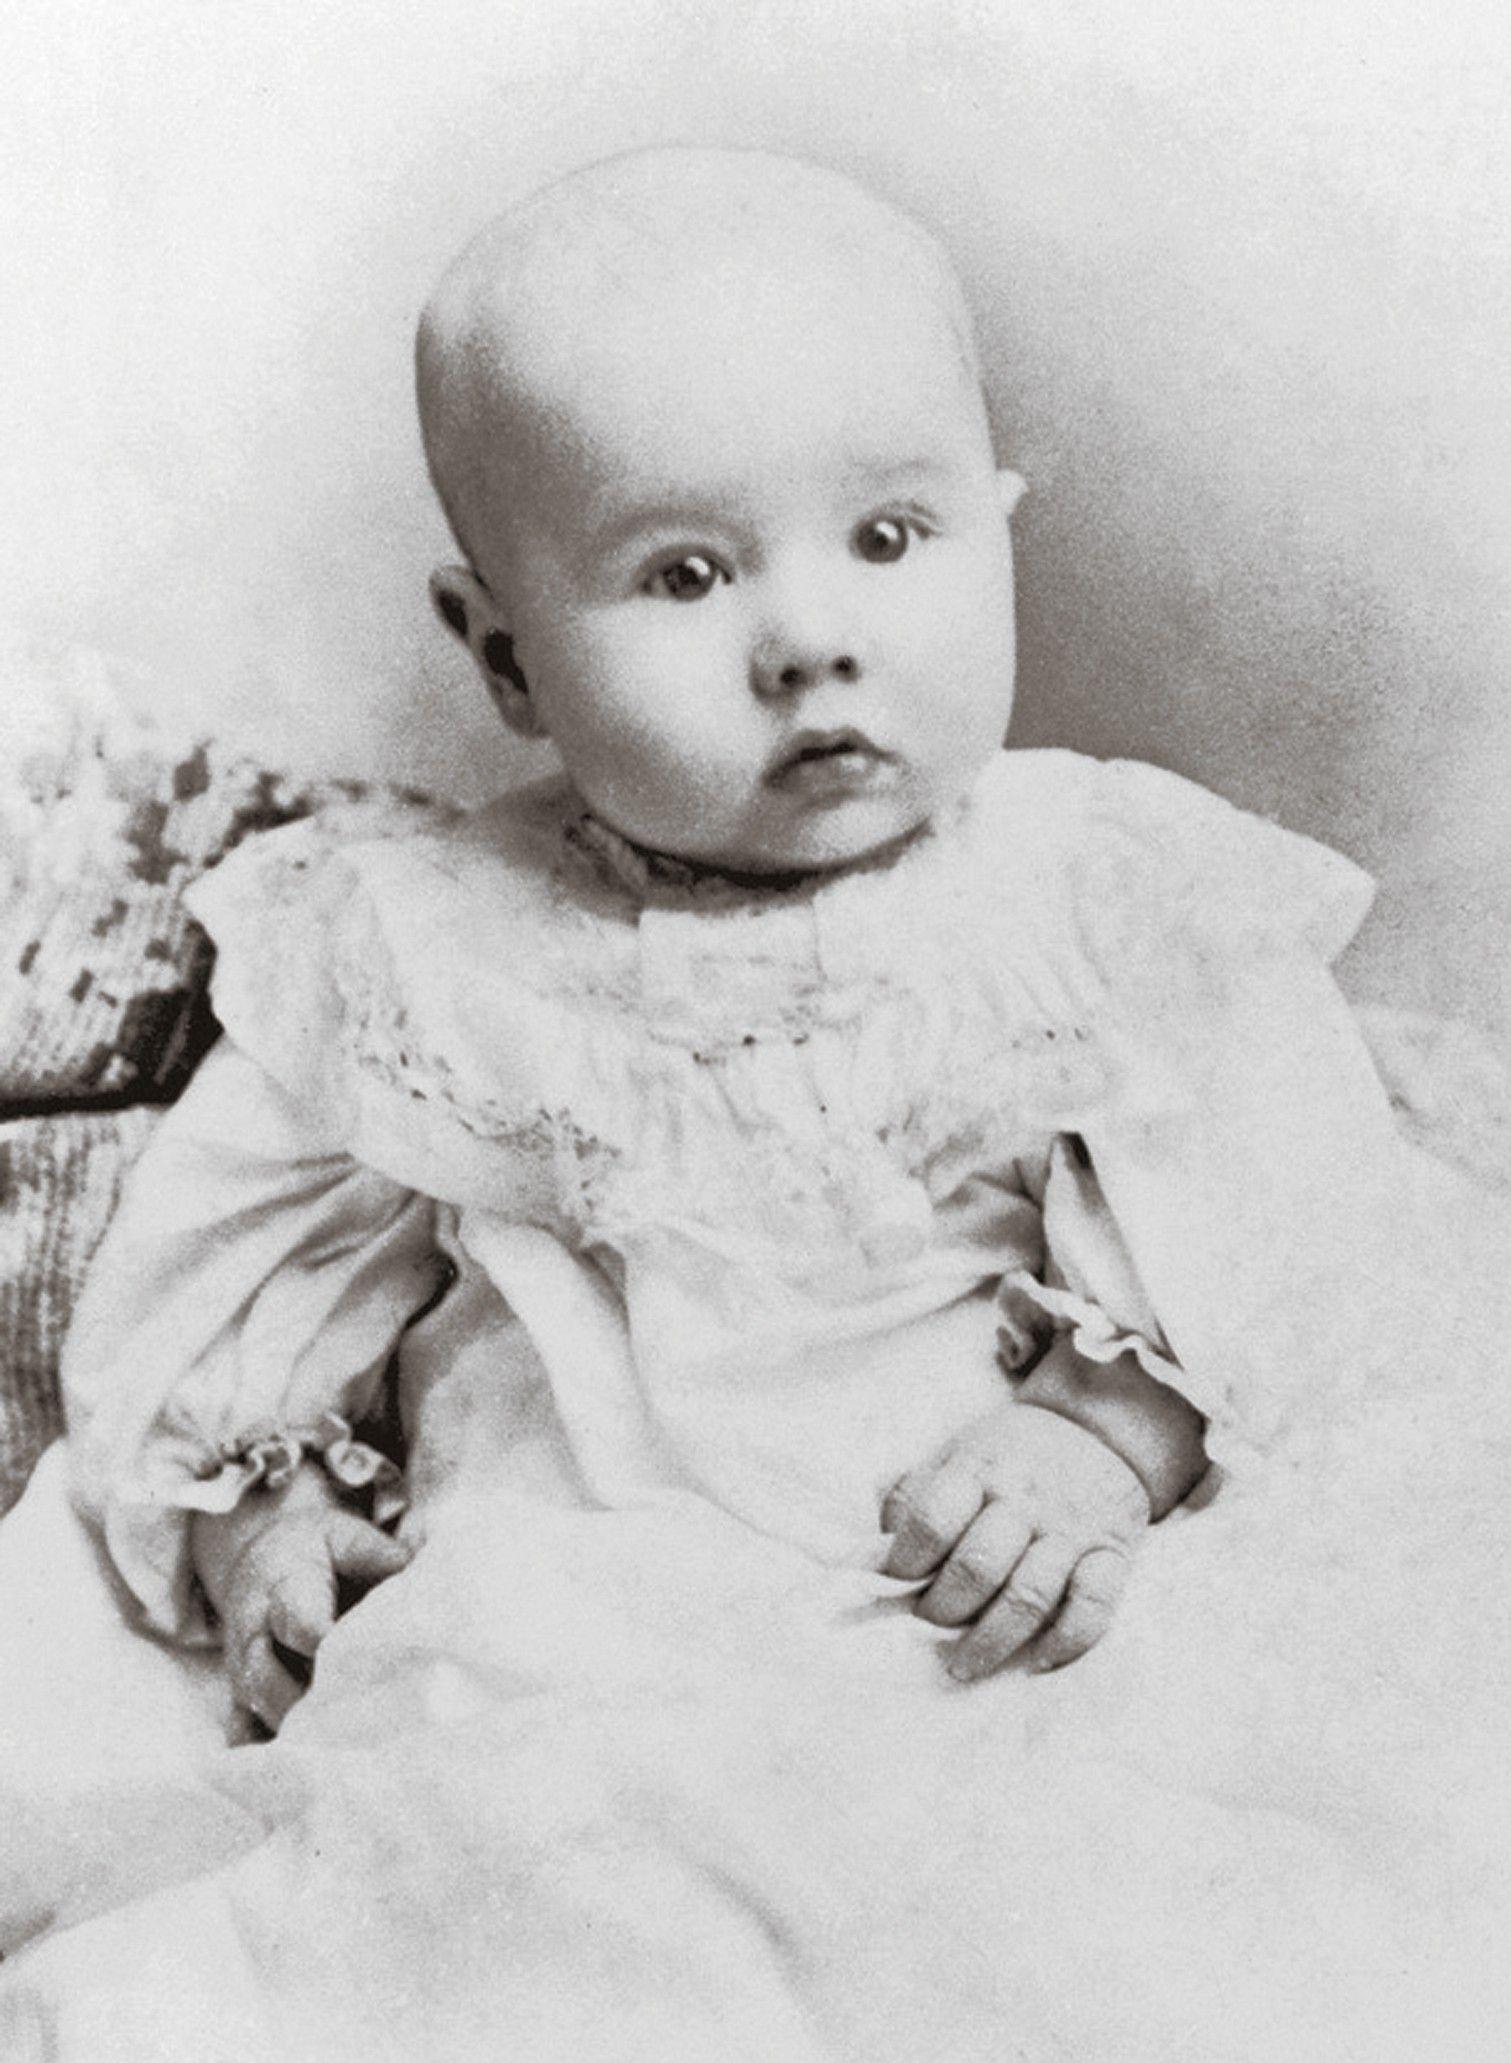 Ezra Taft Benson as a baby in 1900. Teachings of Presidents of the Church: Ezra Taft Benson (2014), xii